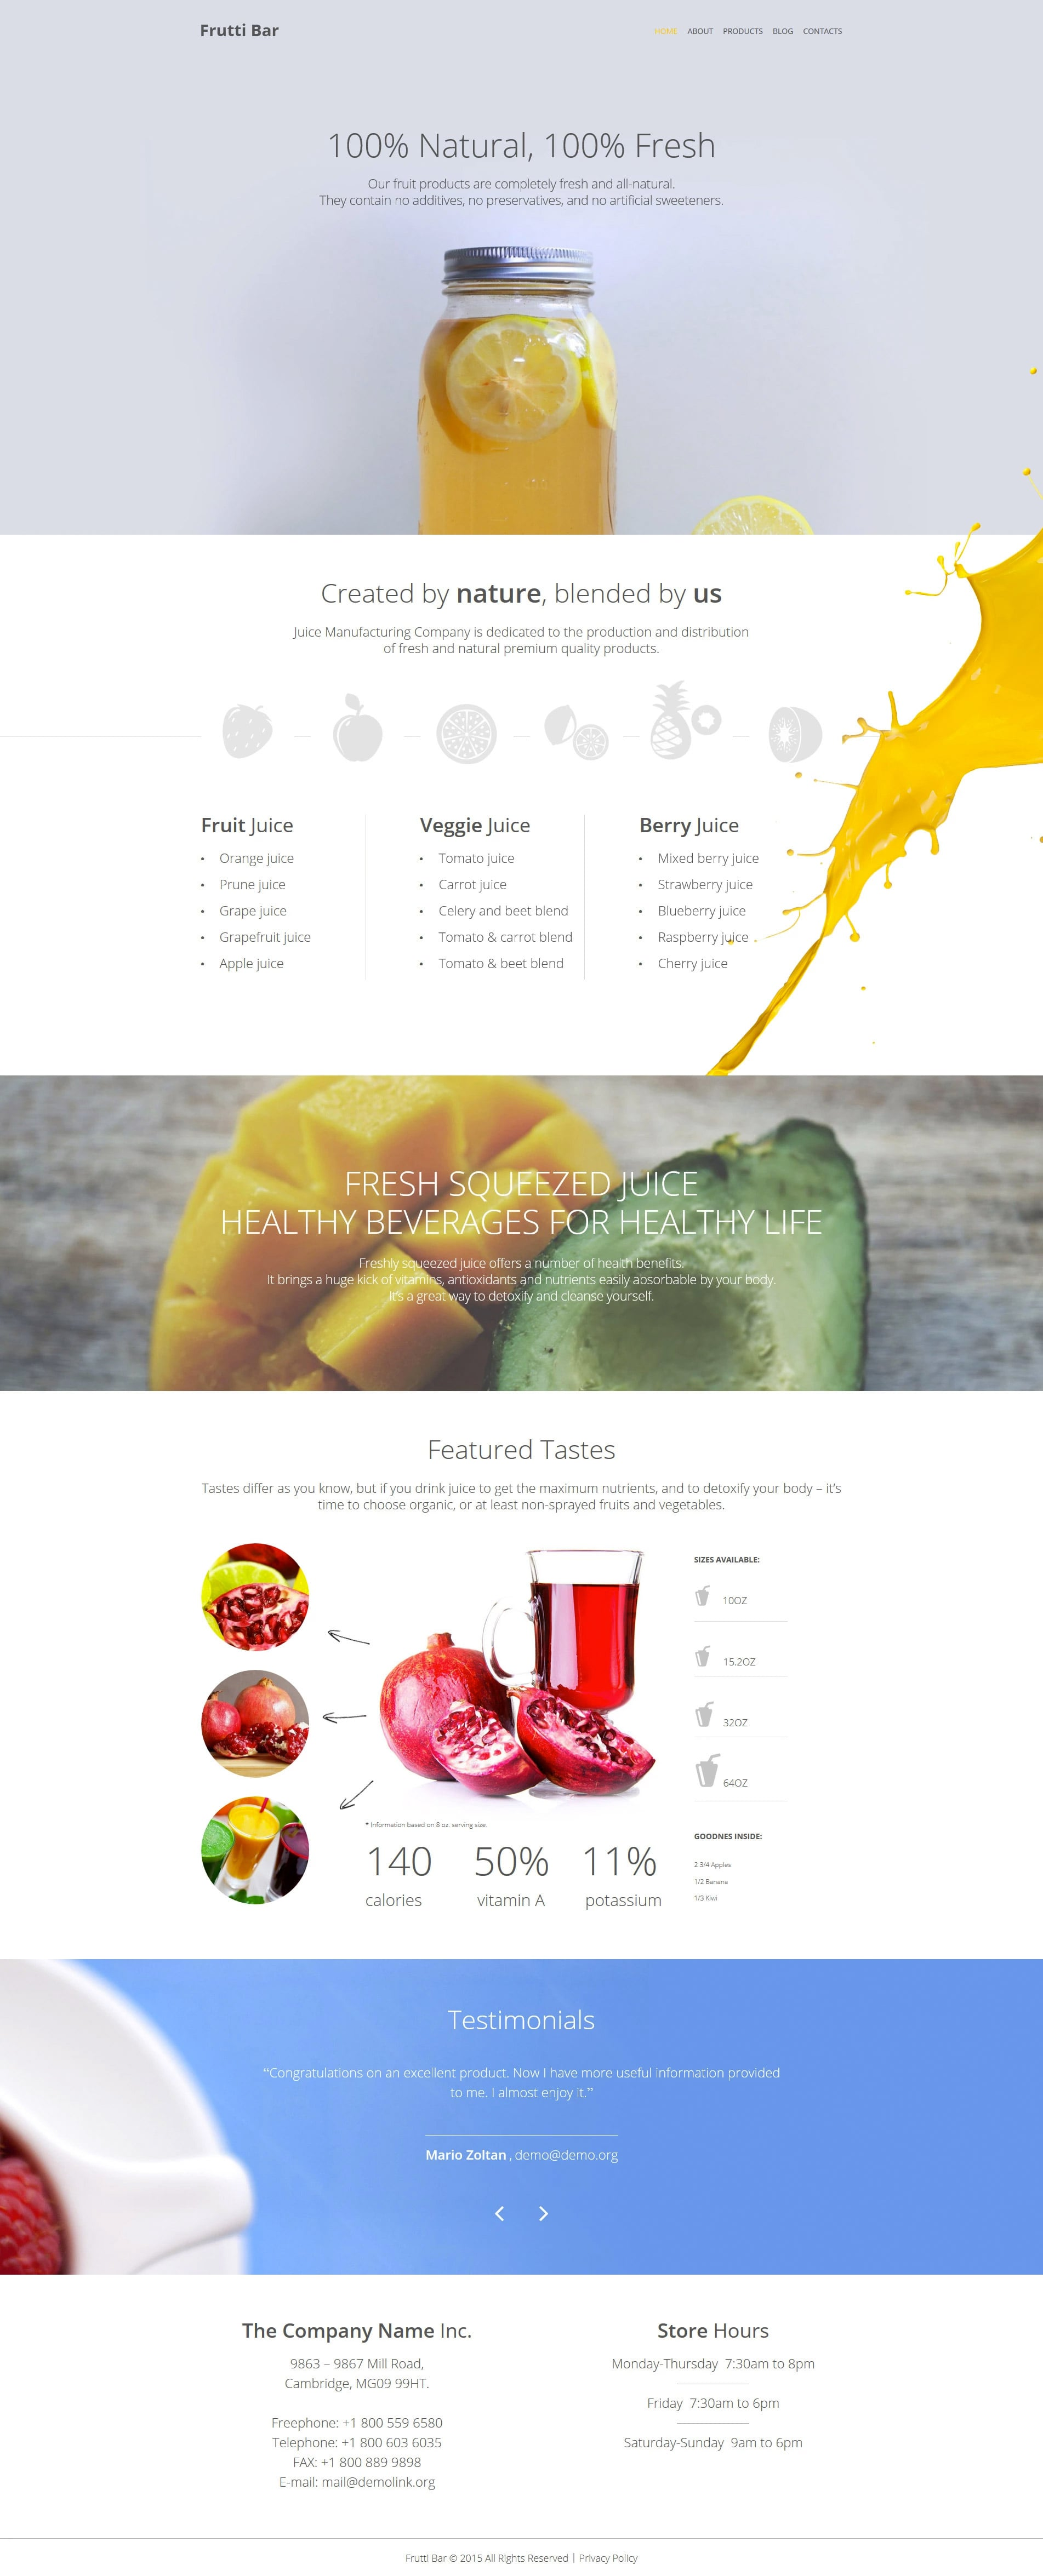 WordPress Food Blog Themes - 10 Premium WP Templates - Untitled 2